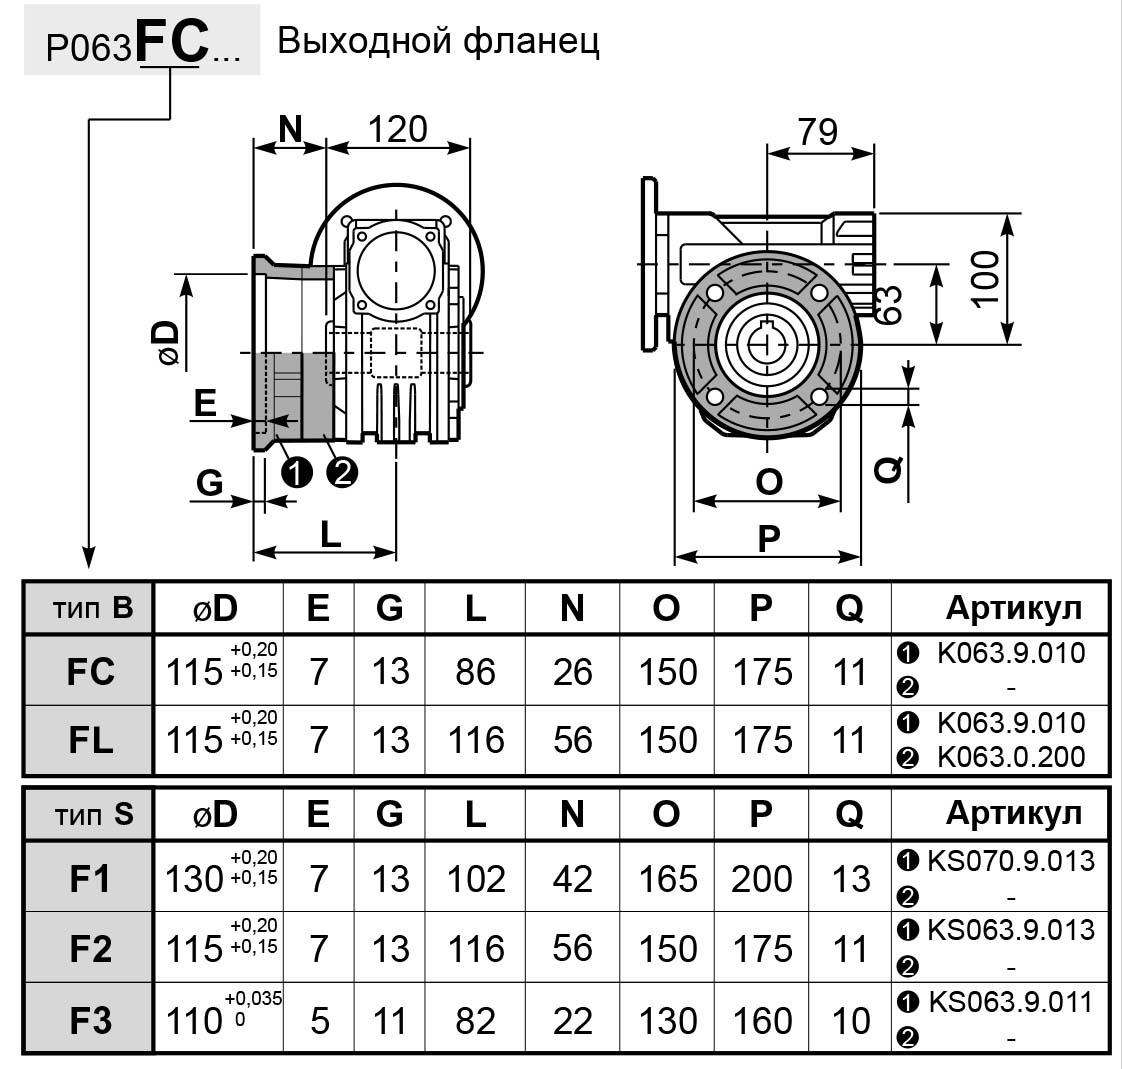 Чертеж редуктора P 063 innovari фланцы